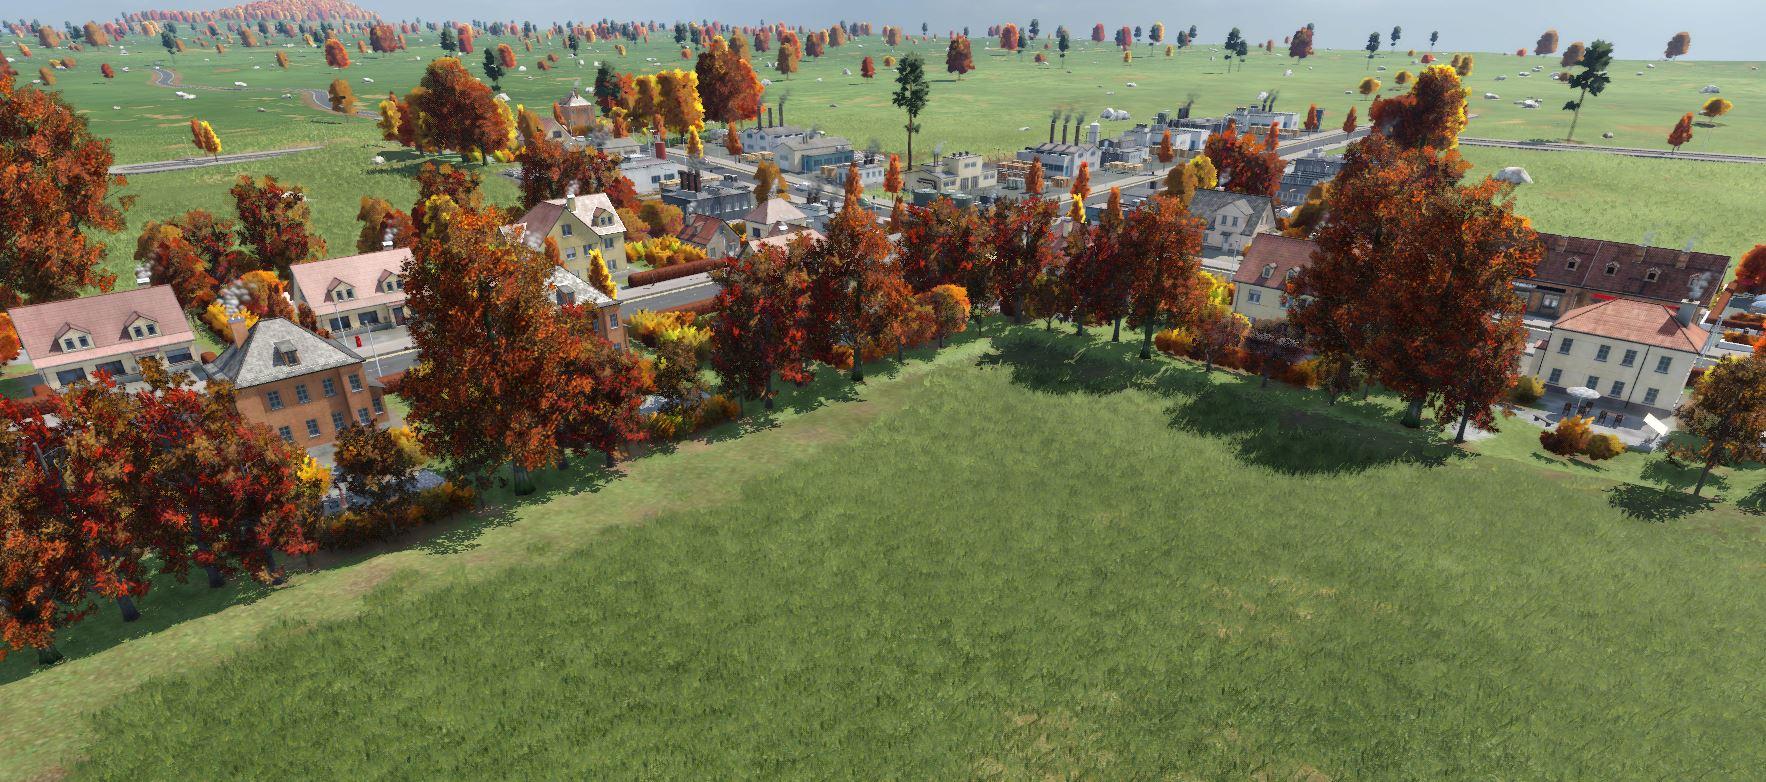 Transport Fever 2 - Autumn Trees